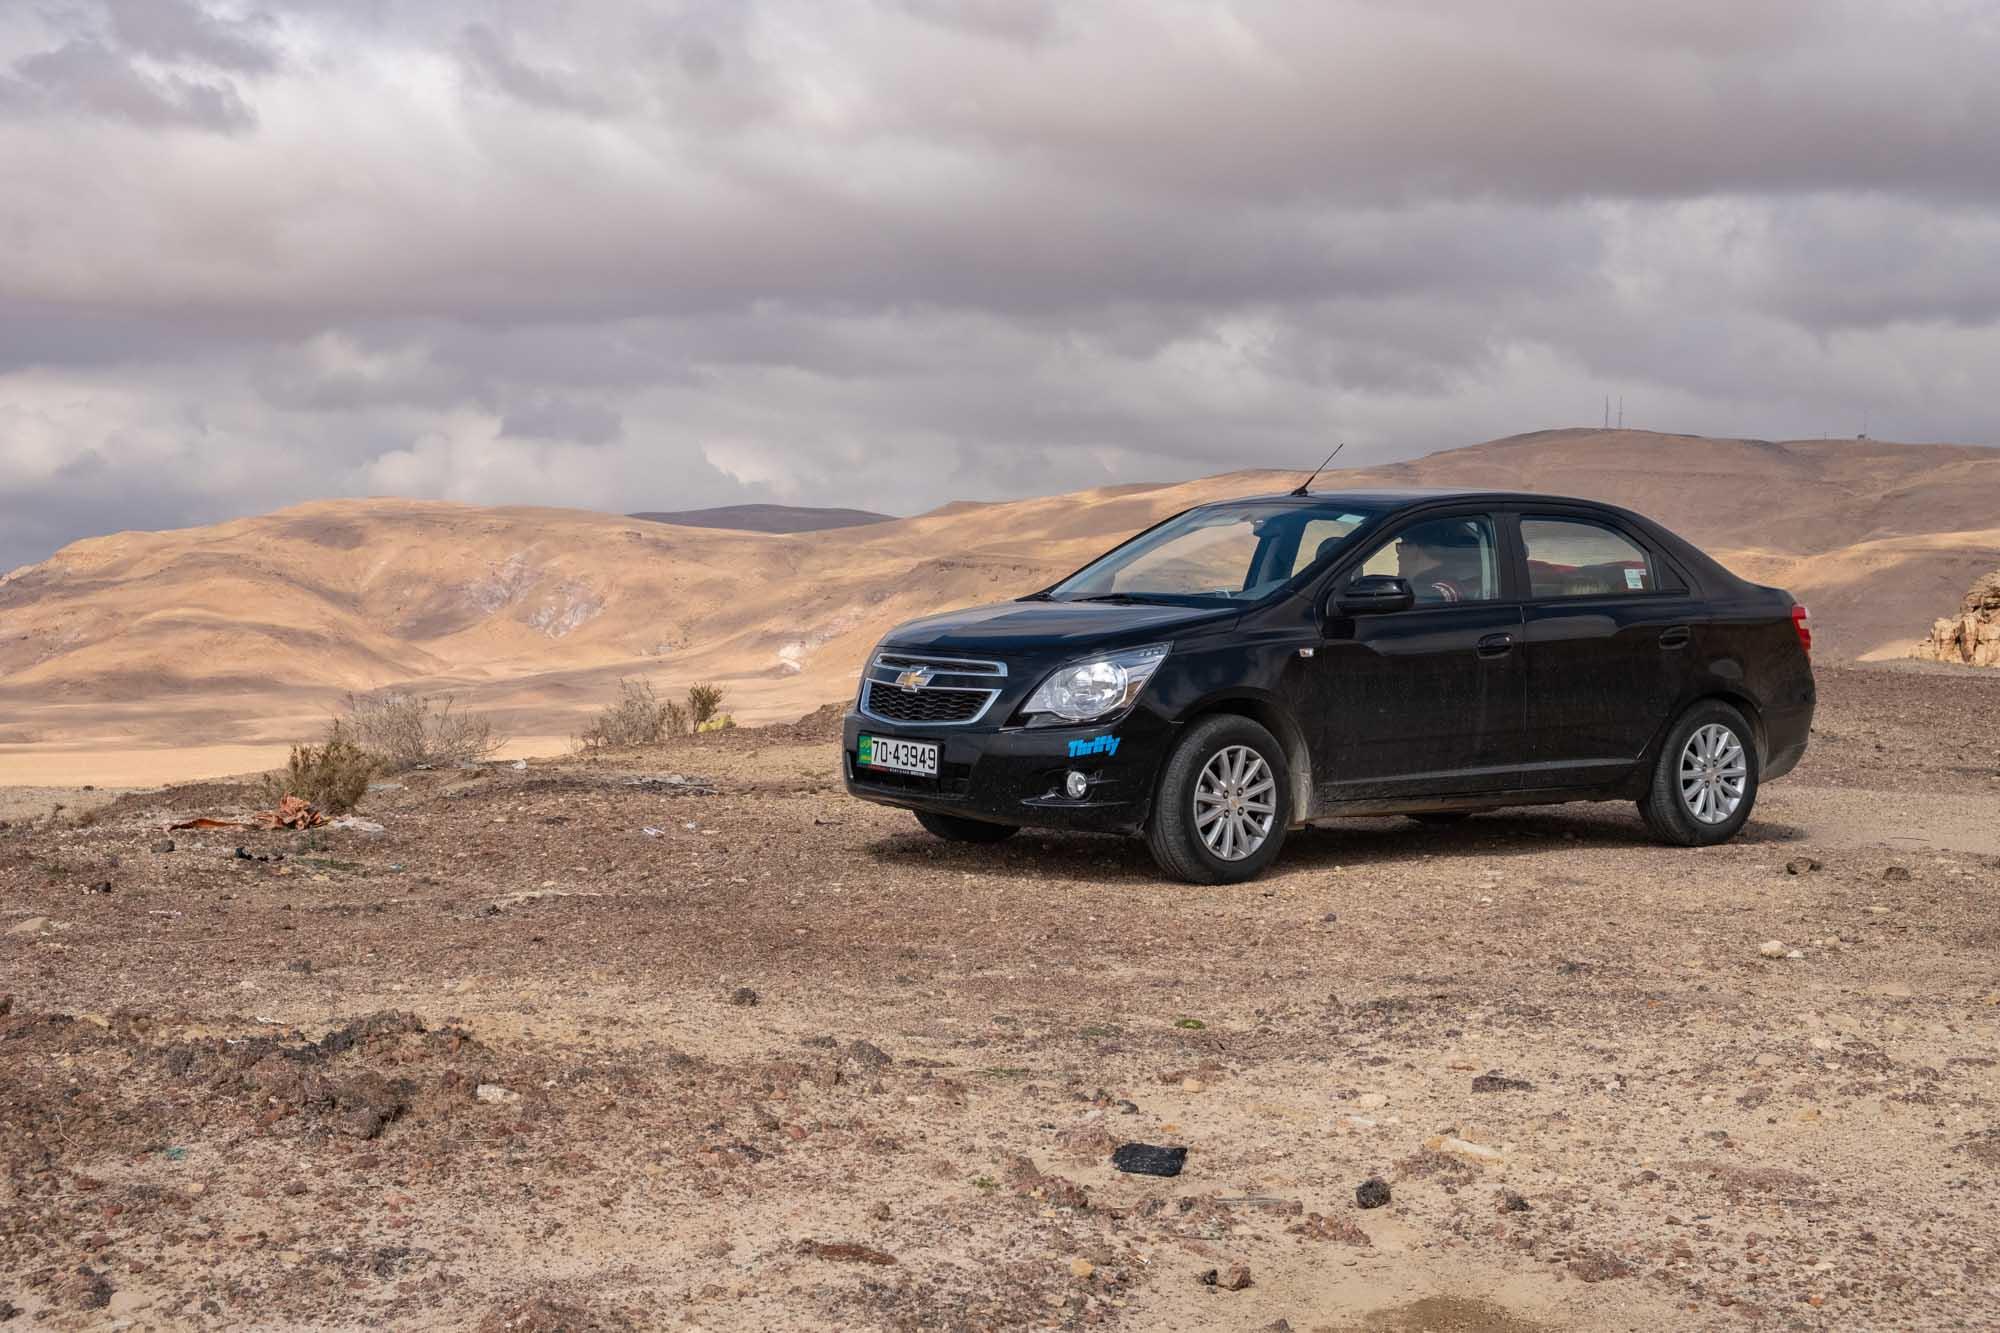 Our hire car near Wadi Mujib